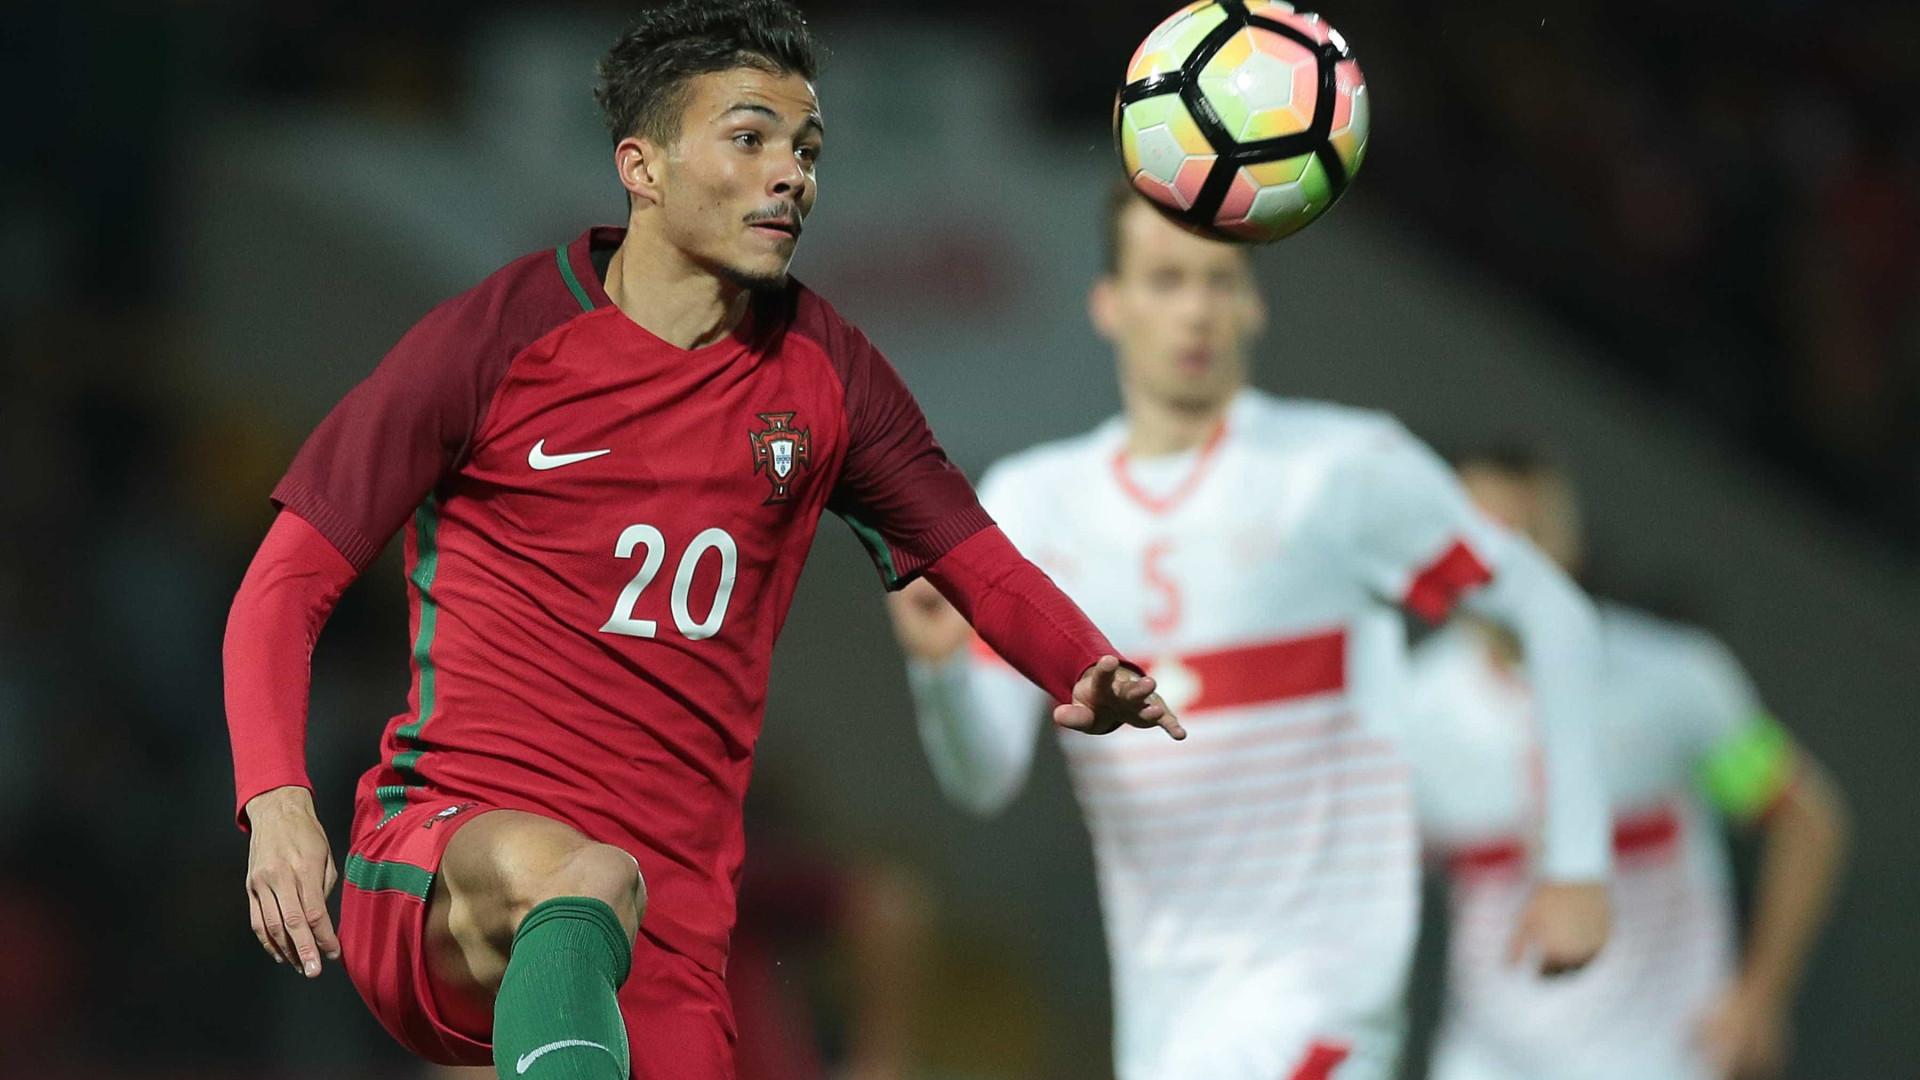 Futebol: Europeu sub-21/ Portugal - Suíça (ficha)